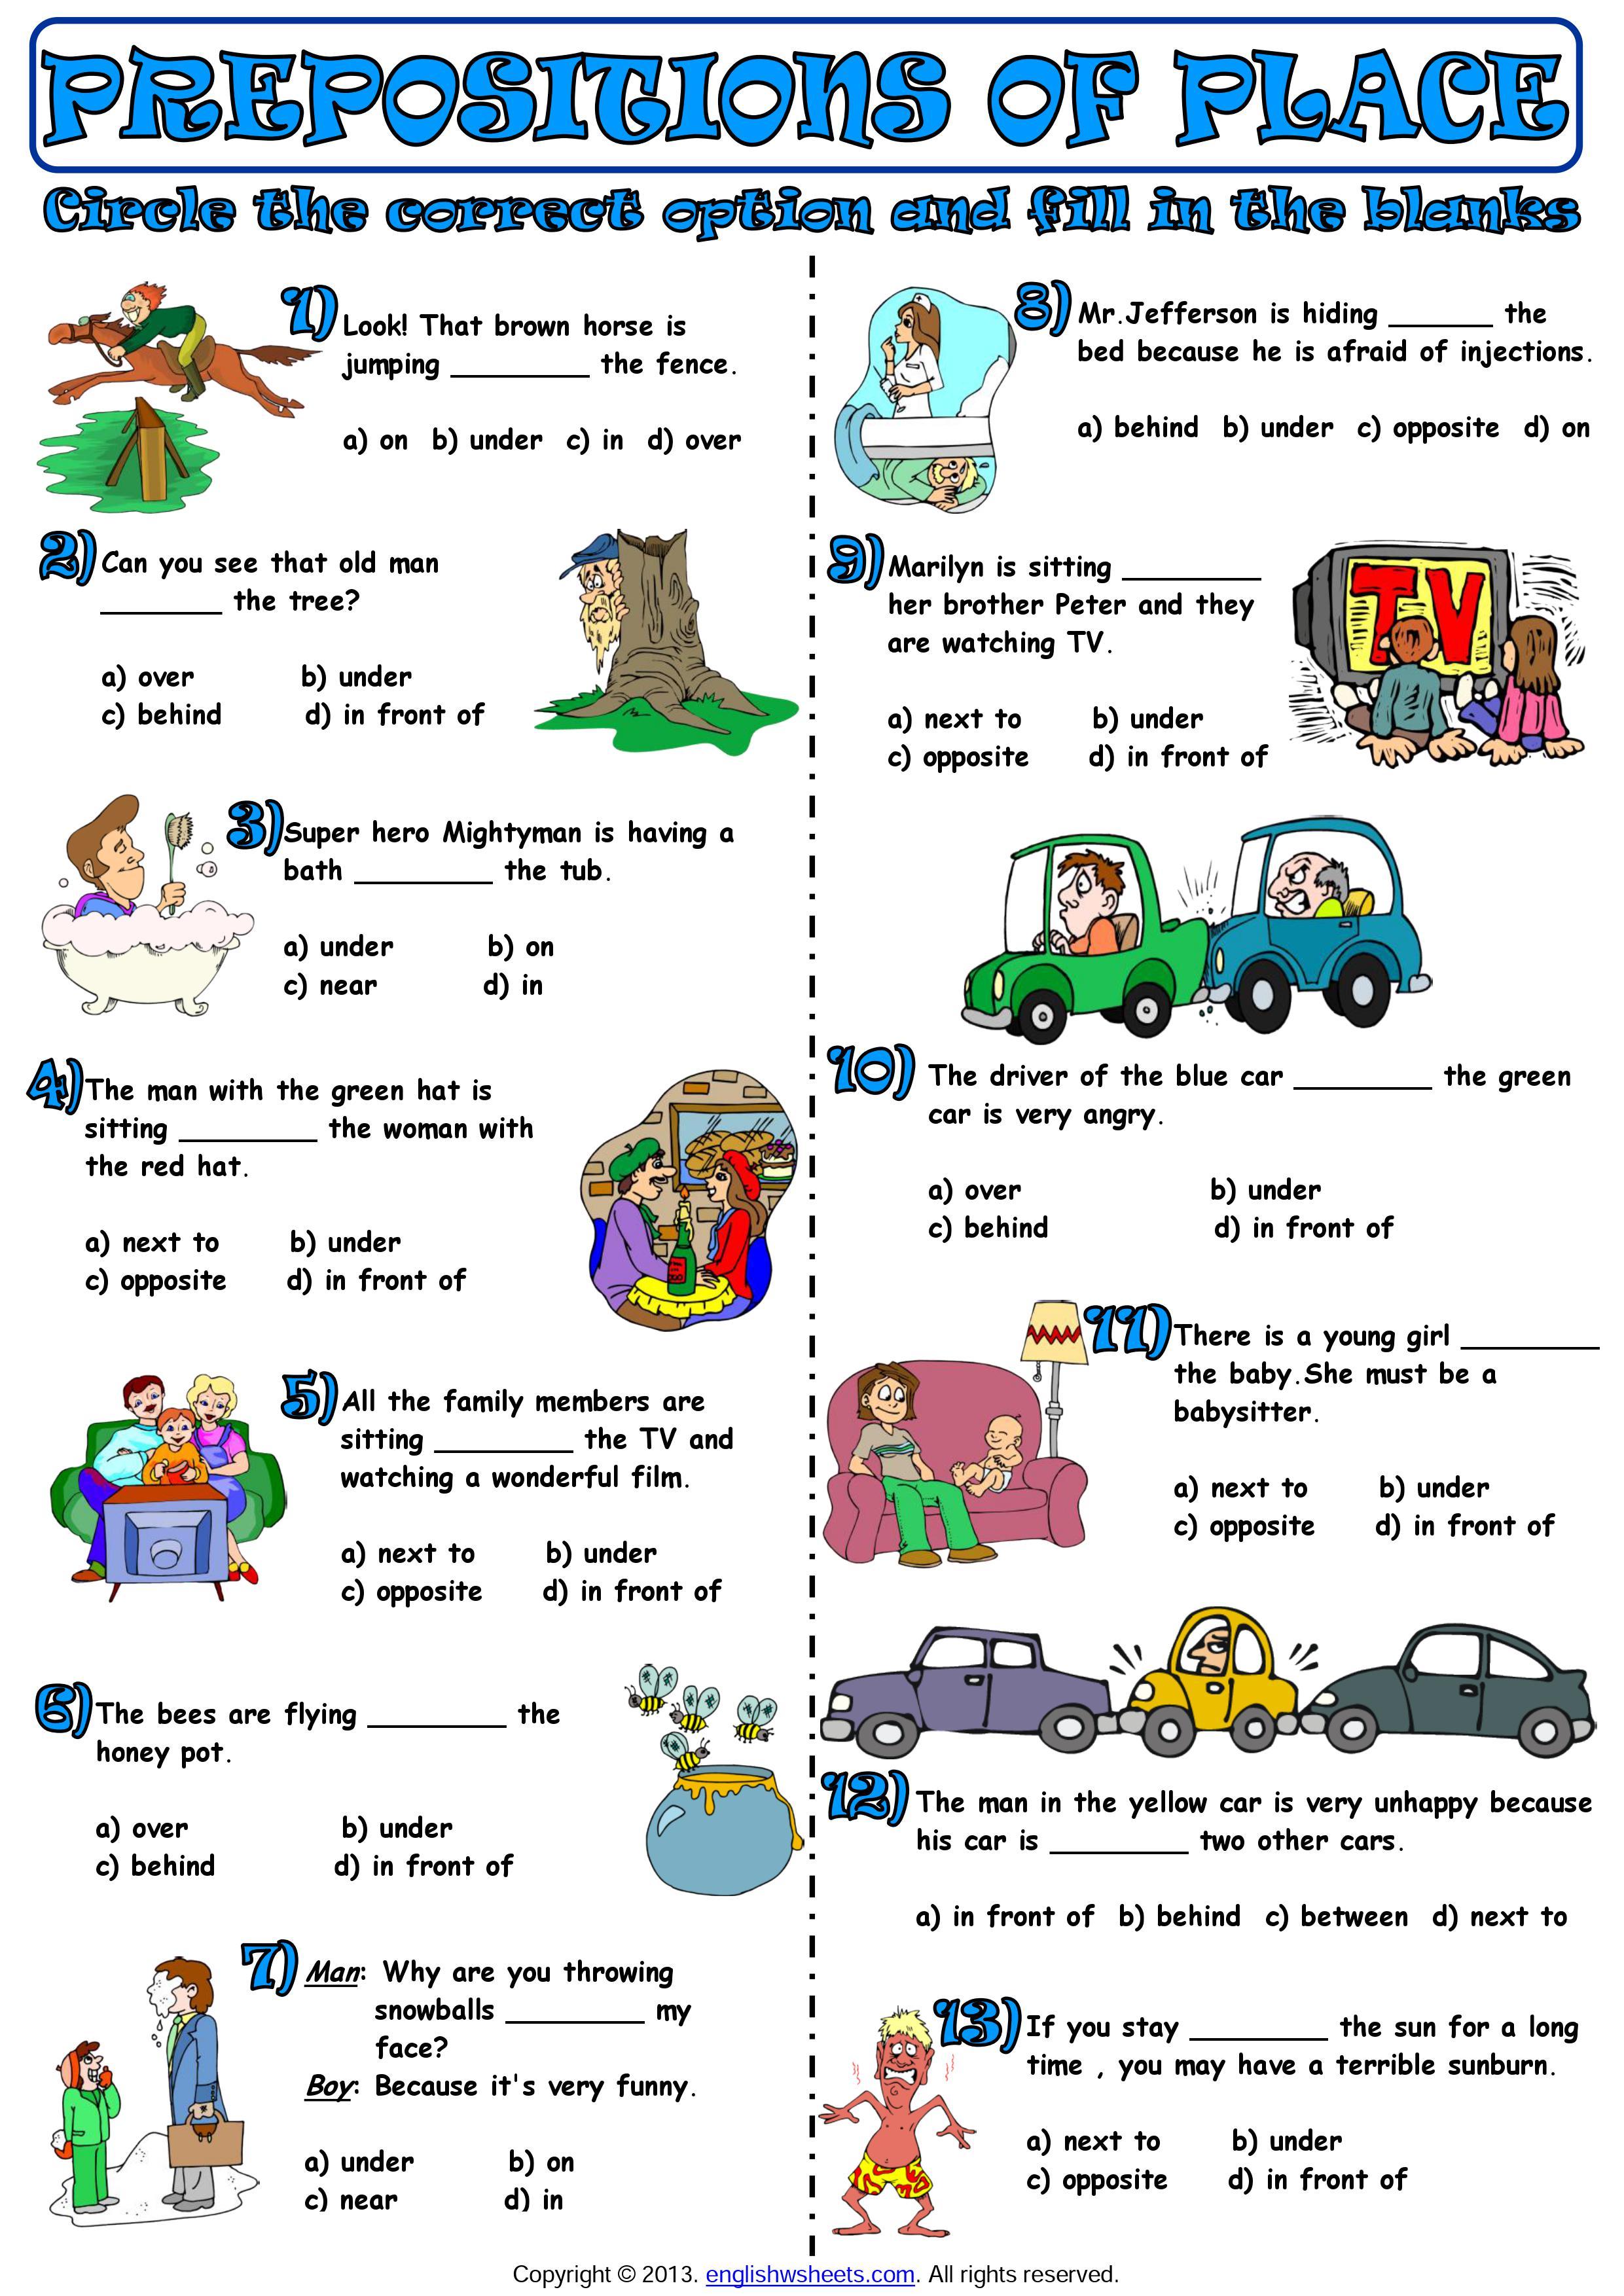 Prepositions Of Place Ingles San Juan Garcia